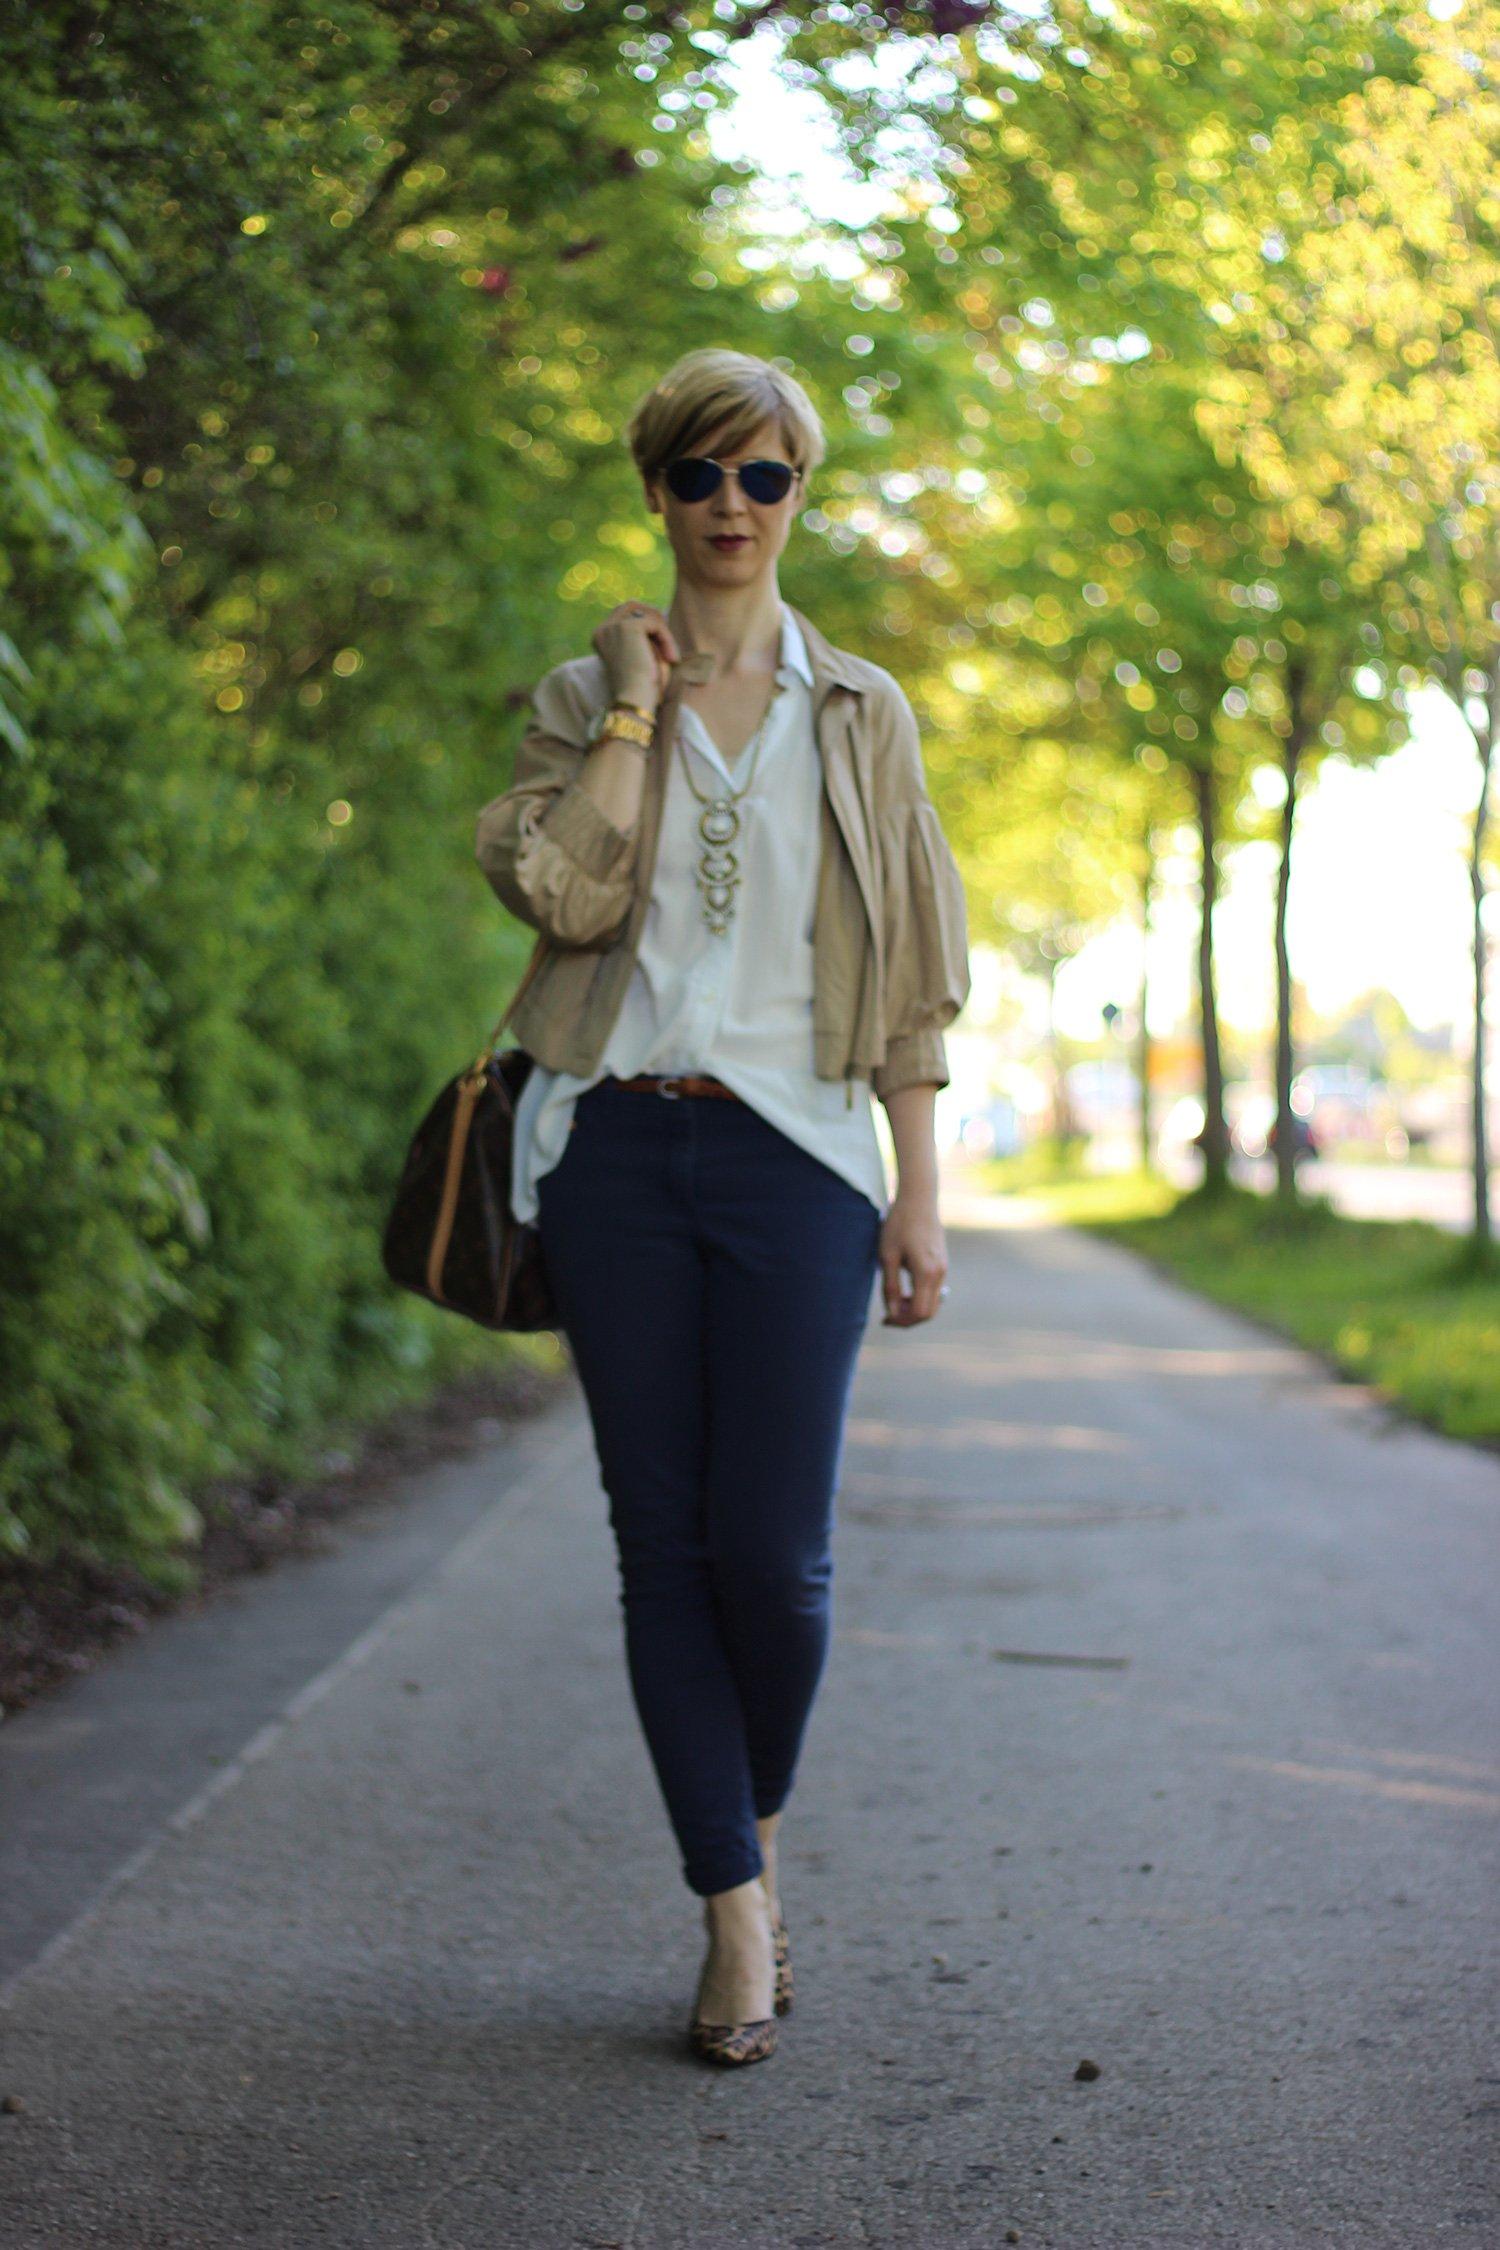 IMG_4079a_IG_leo_leopumps_blue_blau_Lace_Spitze_Bluse_Stellaanddot_Outfit_AHemadundaHos_Conny_Fashion_Modeblog_Escada